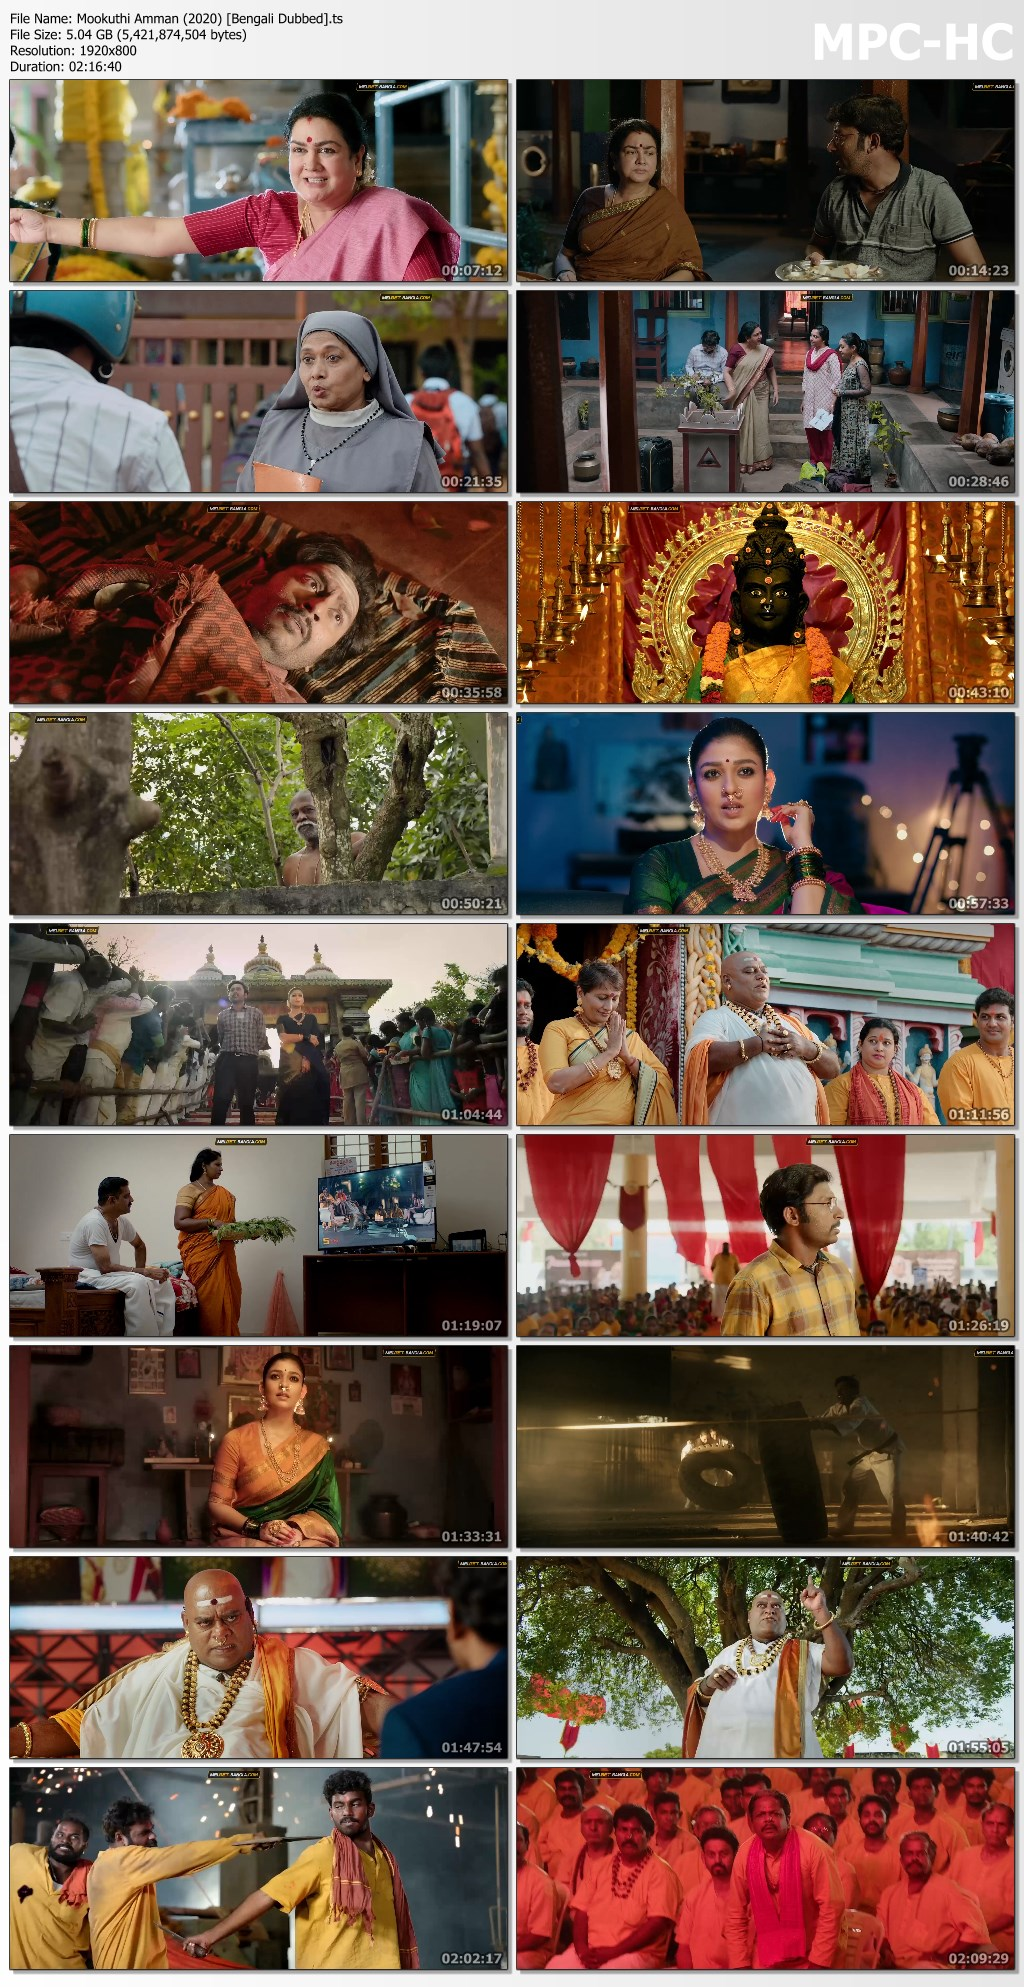 Mookuthi Amman (2020) [Bengali Dubbed].ts thumbs